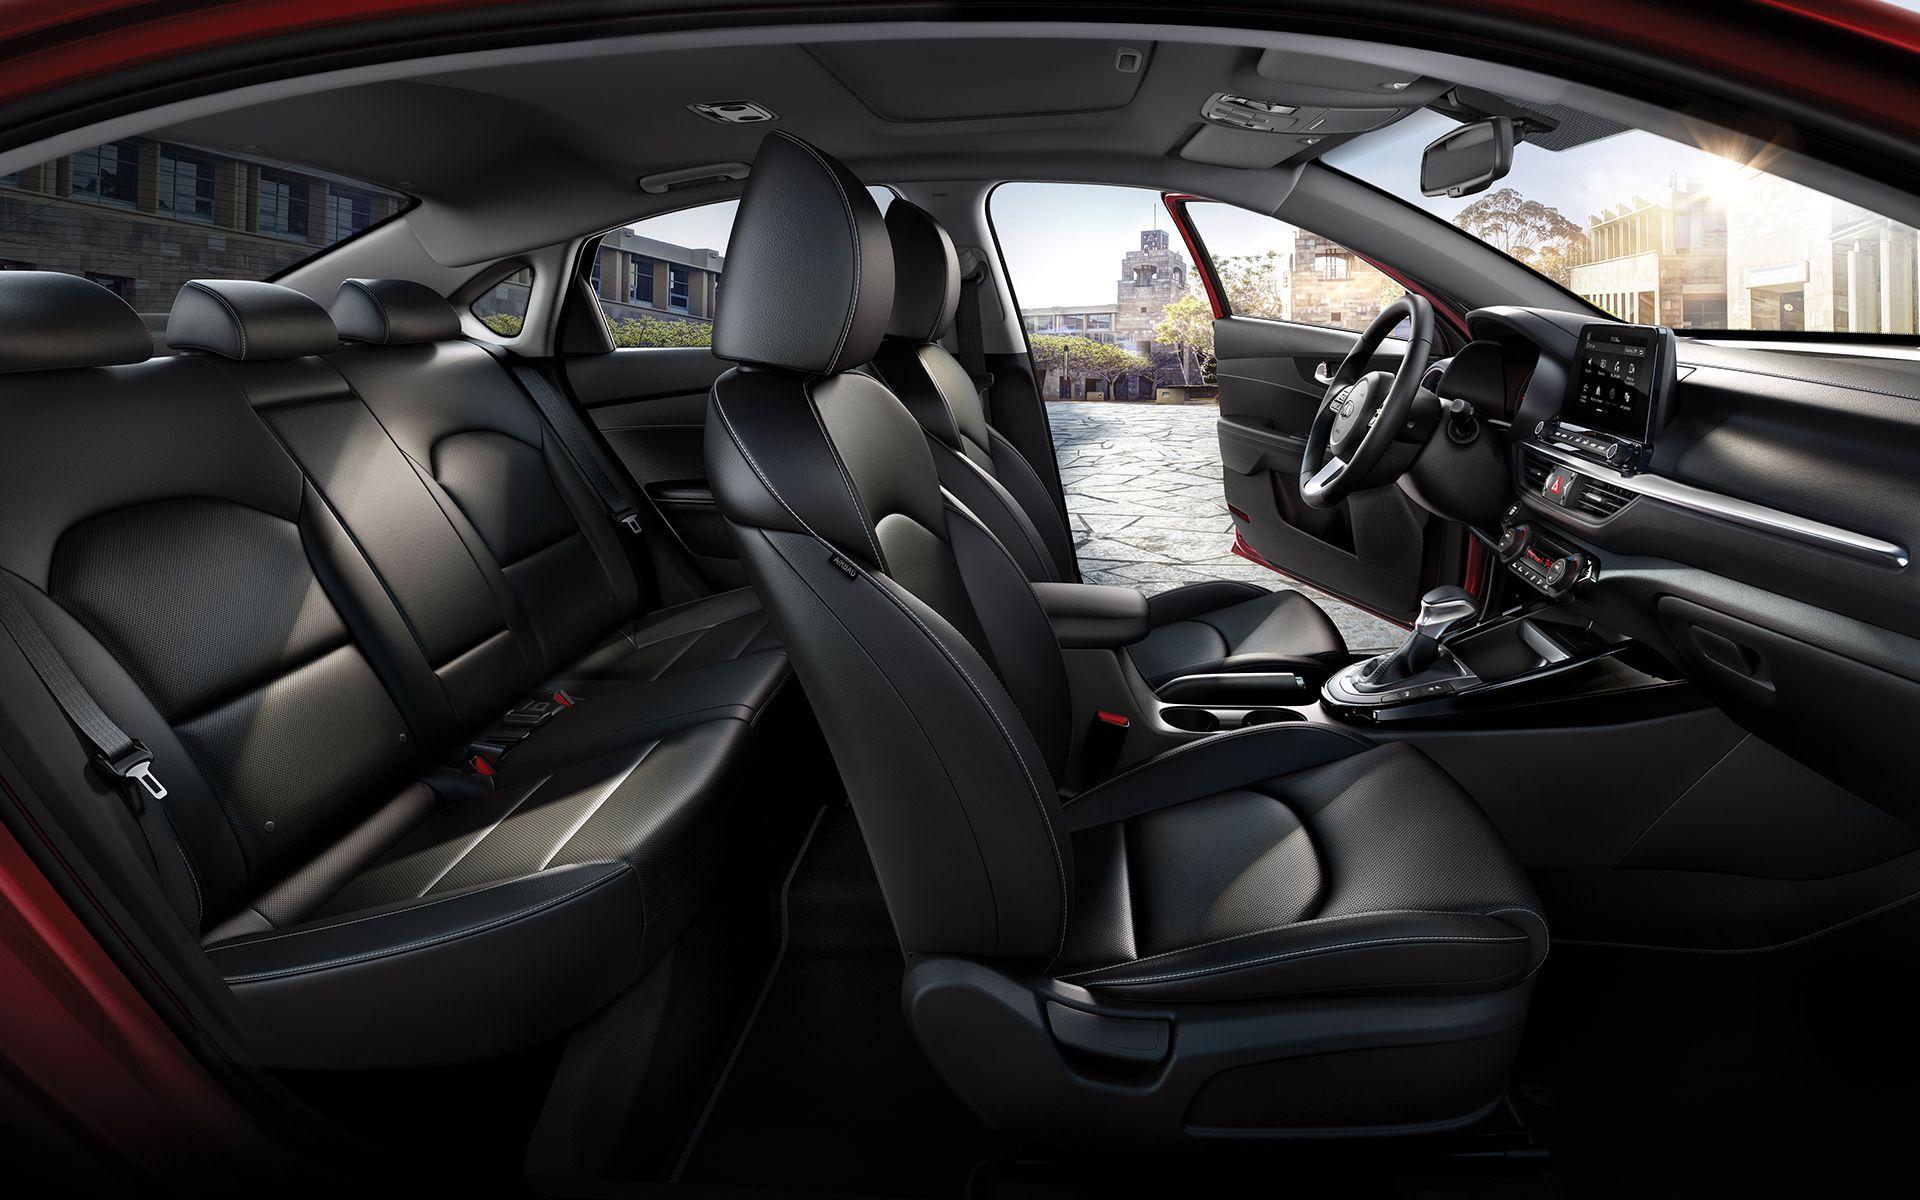 Explore The New Kia Cerato Forte Kia S Stylish 4 Door Compact Sedan Read About Its Interiors Exteriors Price And Other Powerful Featur Kia Sedan Kia Motors